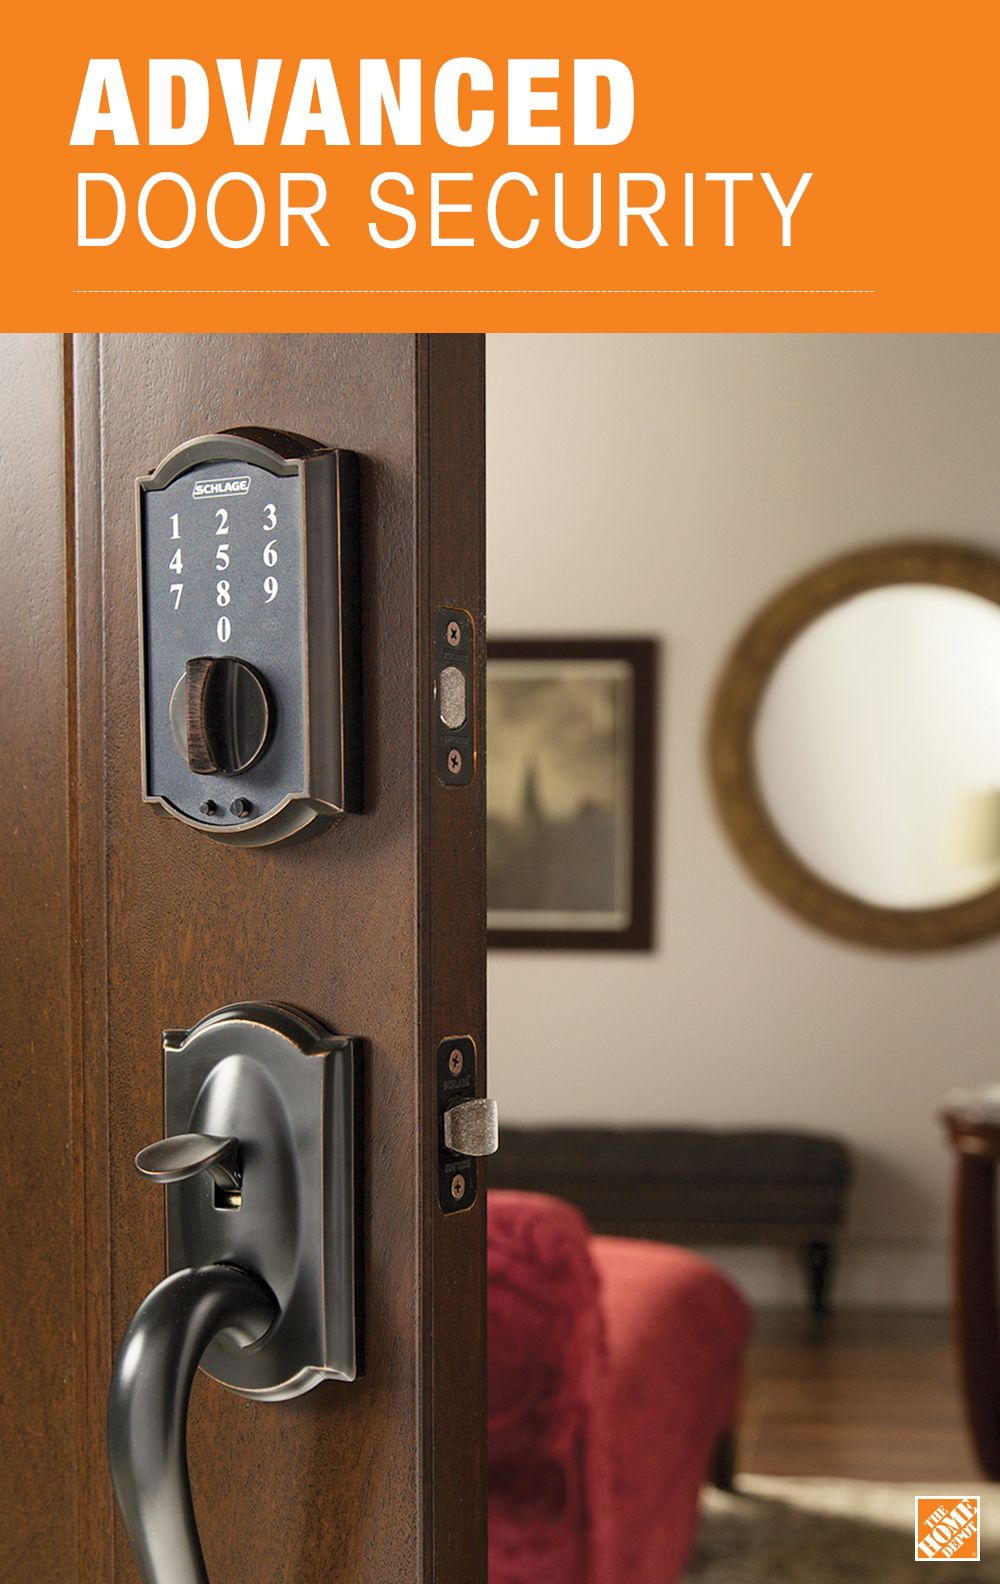 Schlage Camelot Aged Bronze Touch Electronic Door Lock Deadbolt Be375 Cam 716 Casas Modos De Vida Muebles